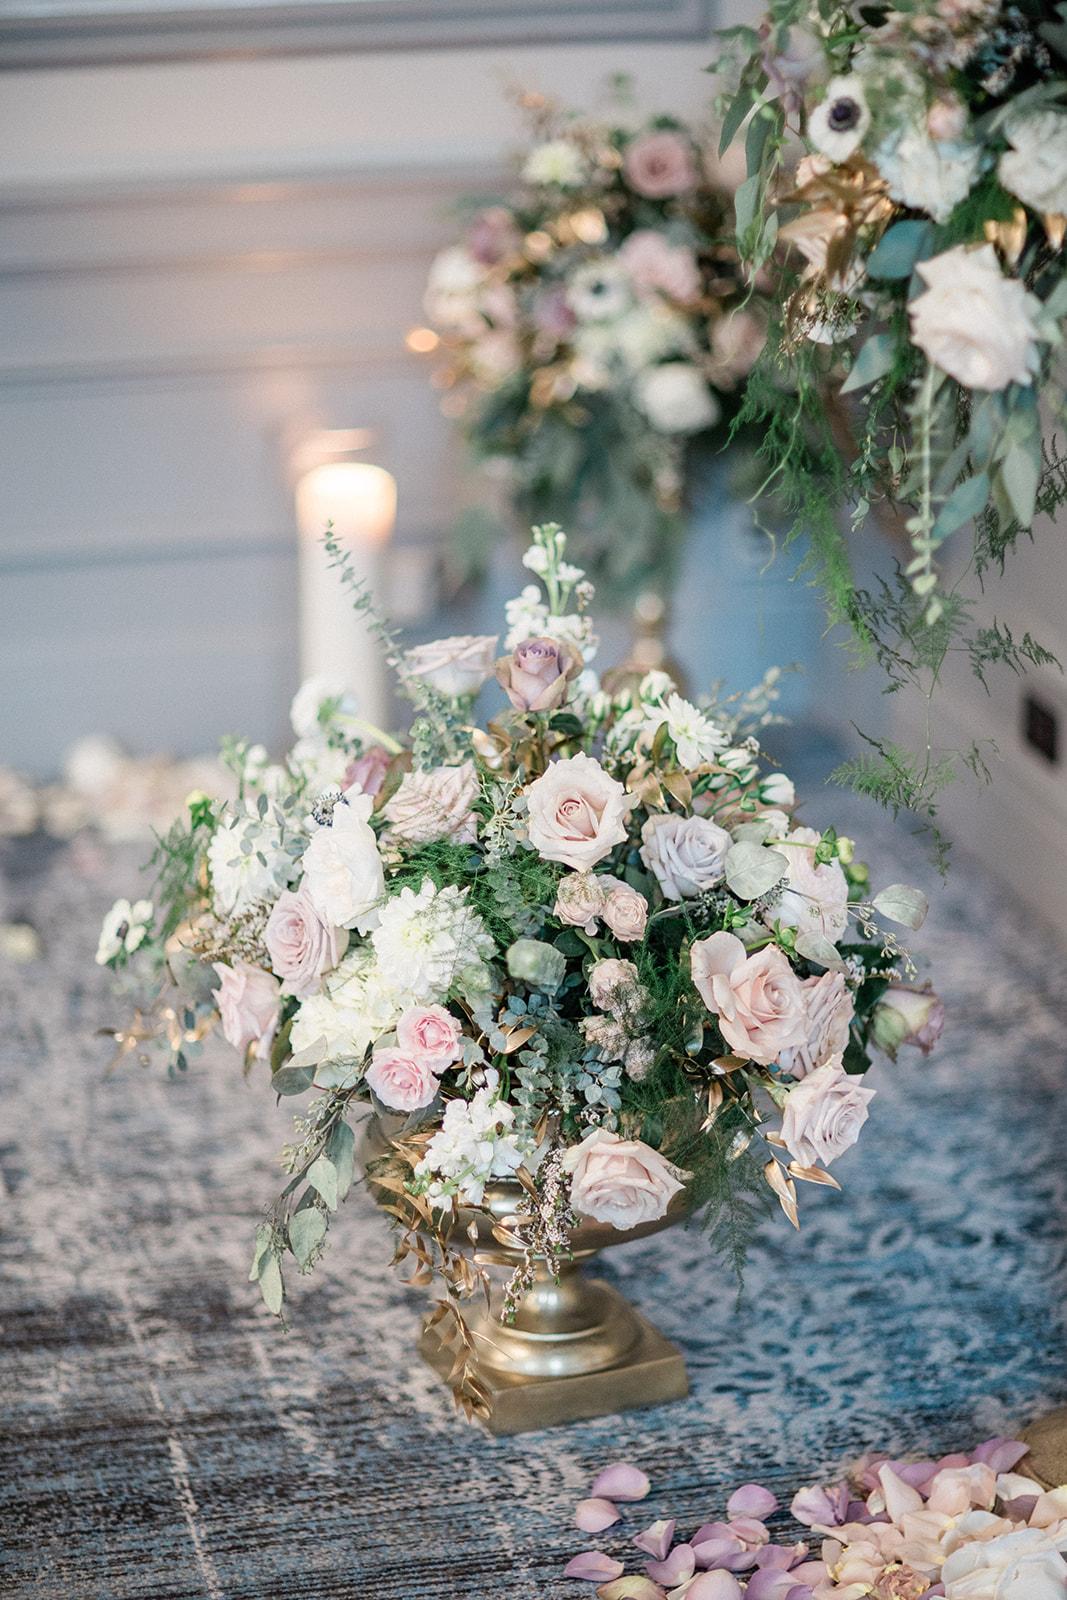 LisaCatherinePhotography_Jasmeen&Darren_Wedding-838_websize.jpg